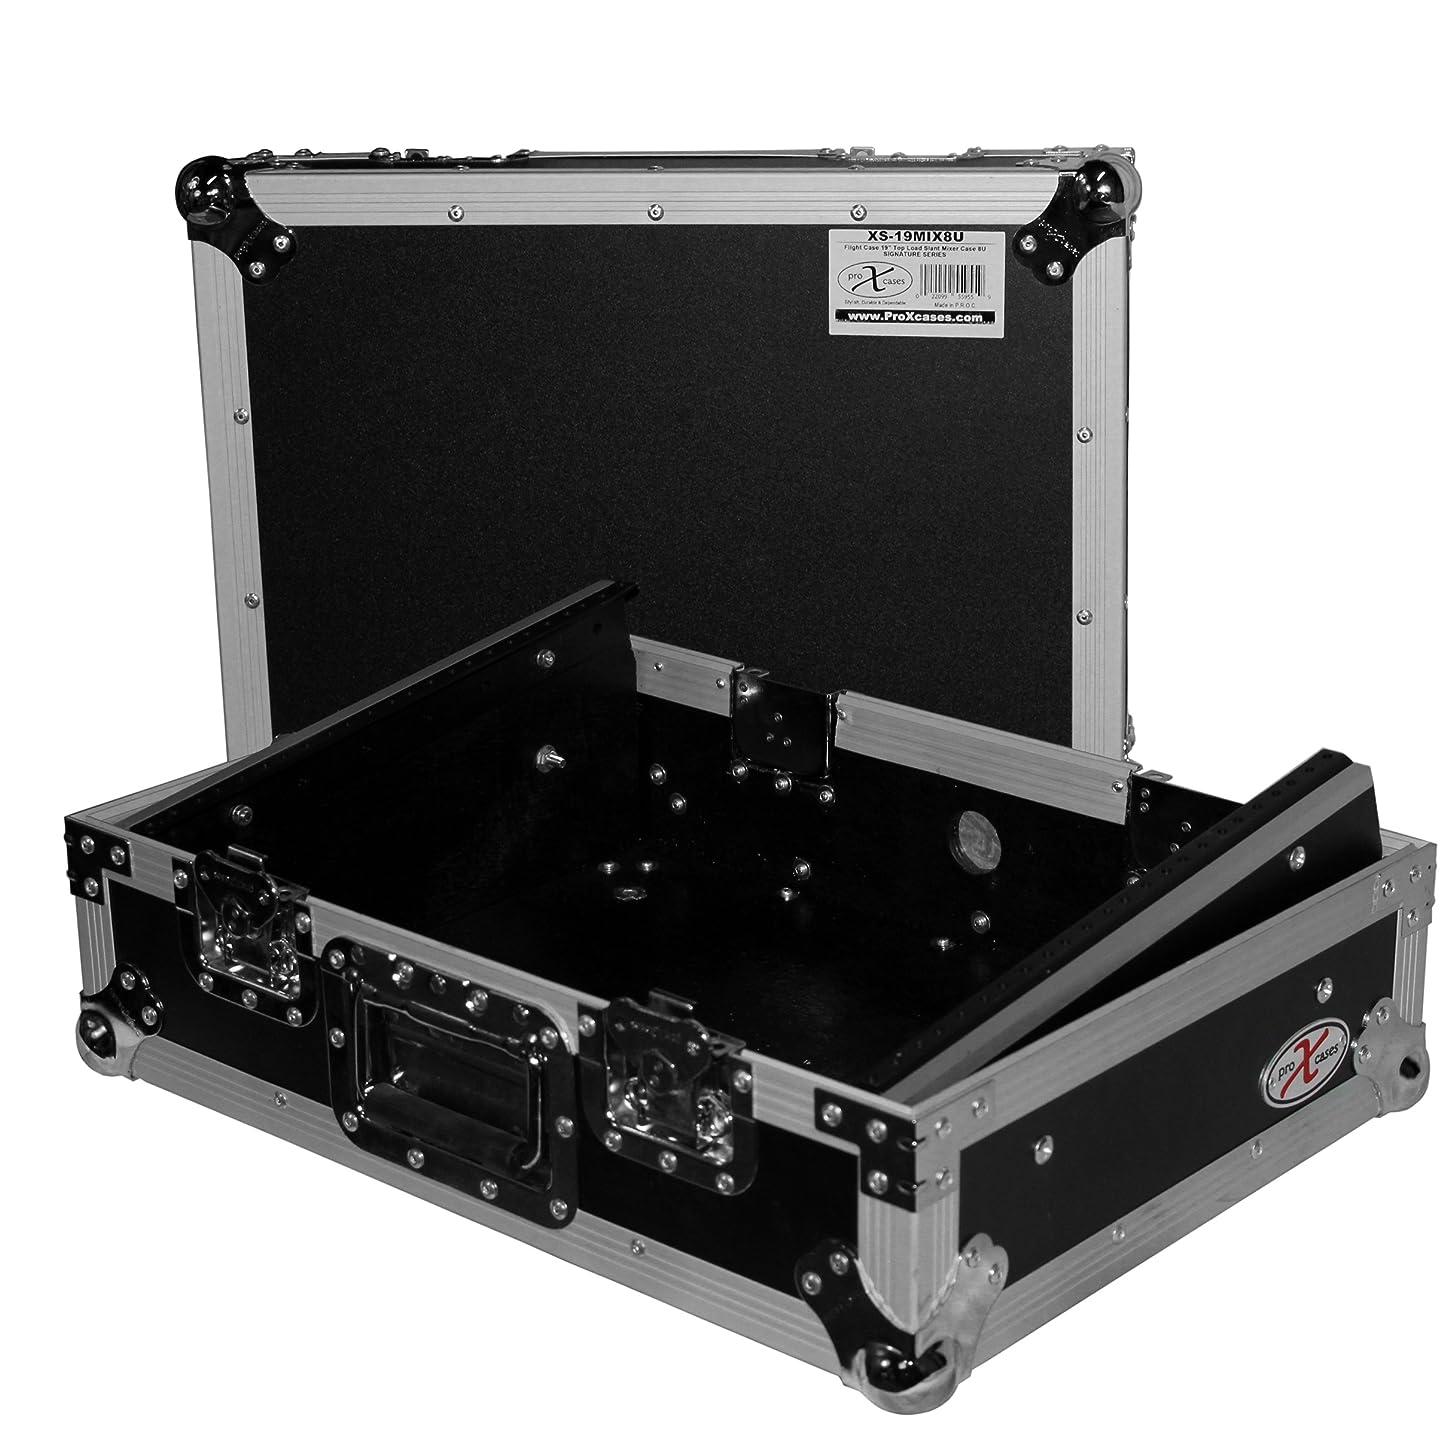 ProX XS-19MIX8U 8U Top Mount 19in Slanted Mixer Case